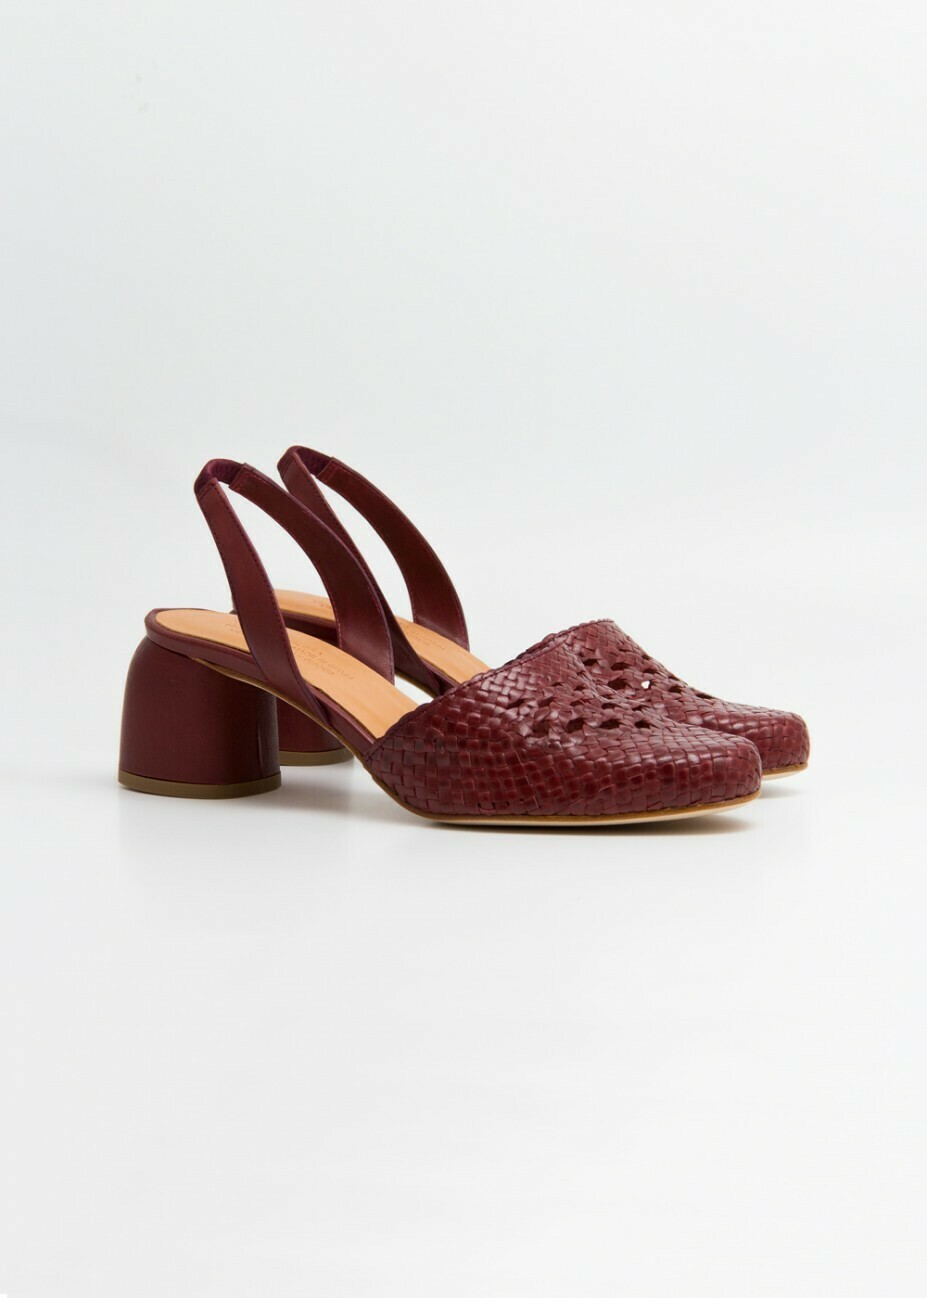 Amante Shoes, Naguisa